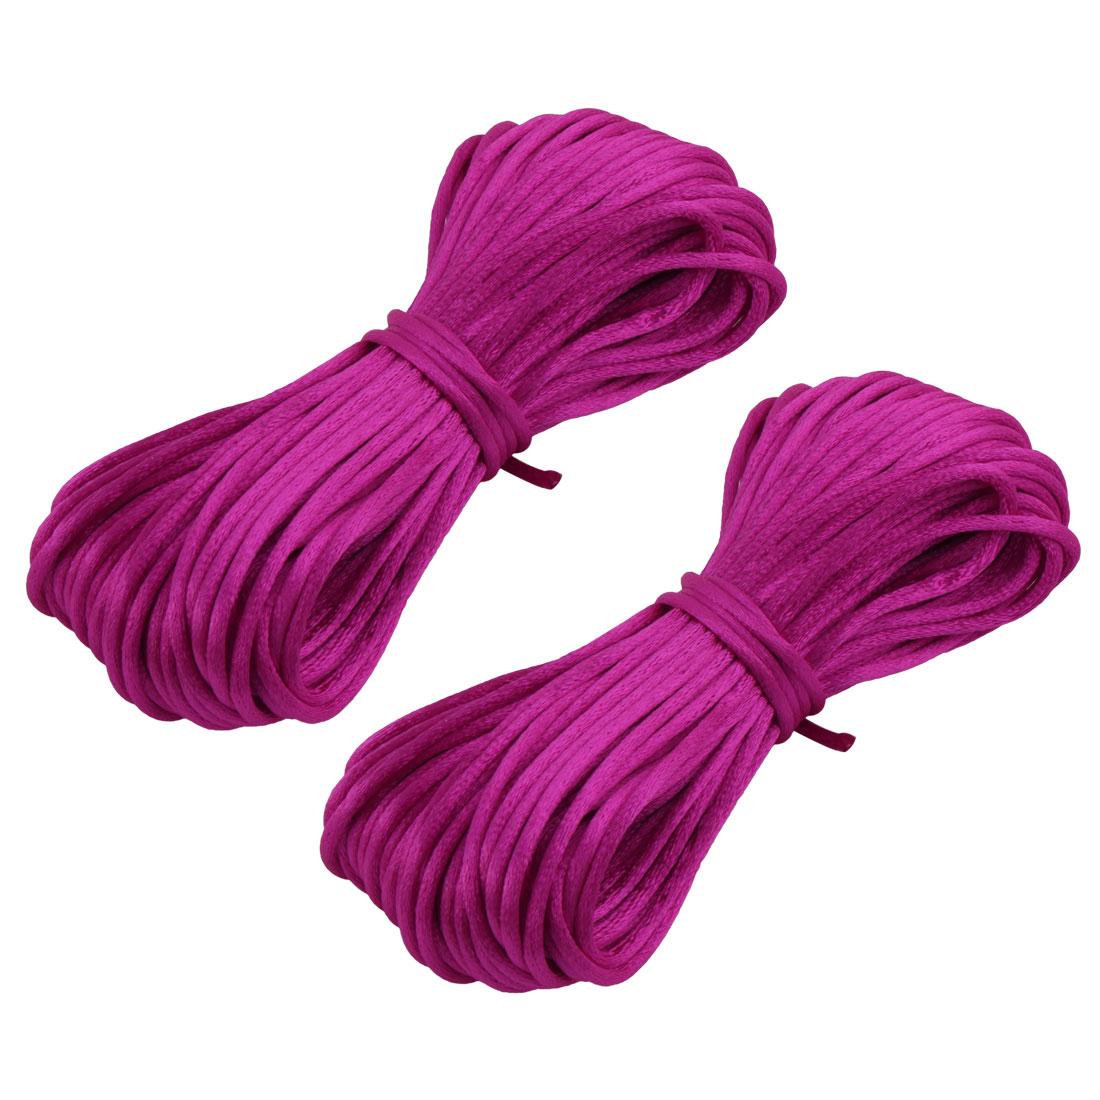 Festival Nylon Handmade DIY Chinese Knot Cord String Dark Fuchsia 22 Yards 2pcs